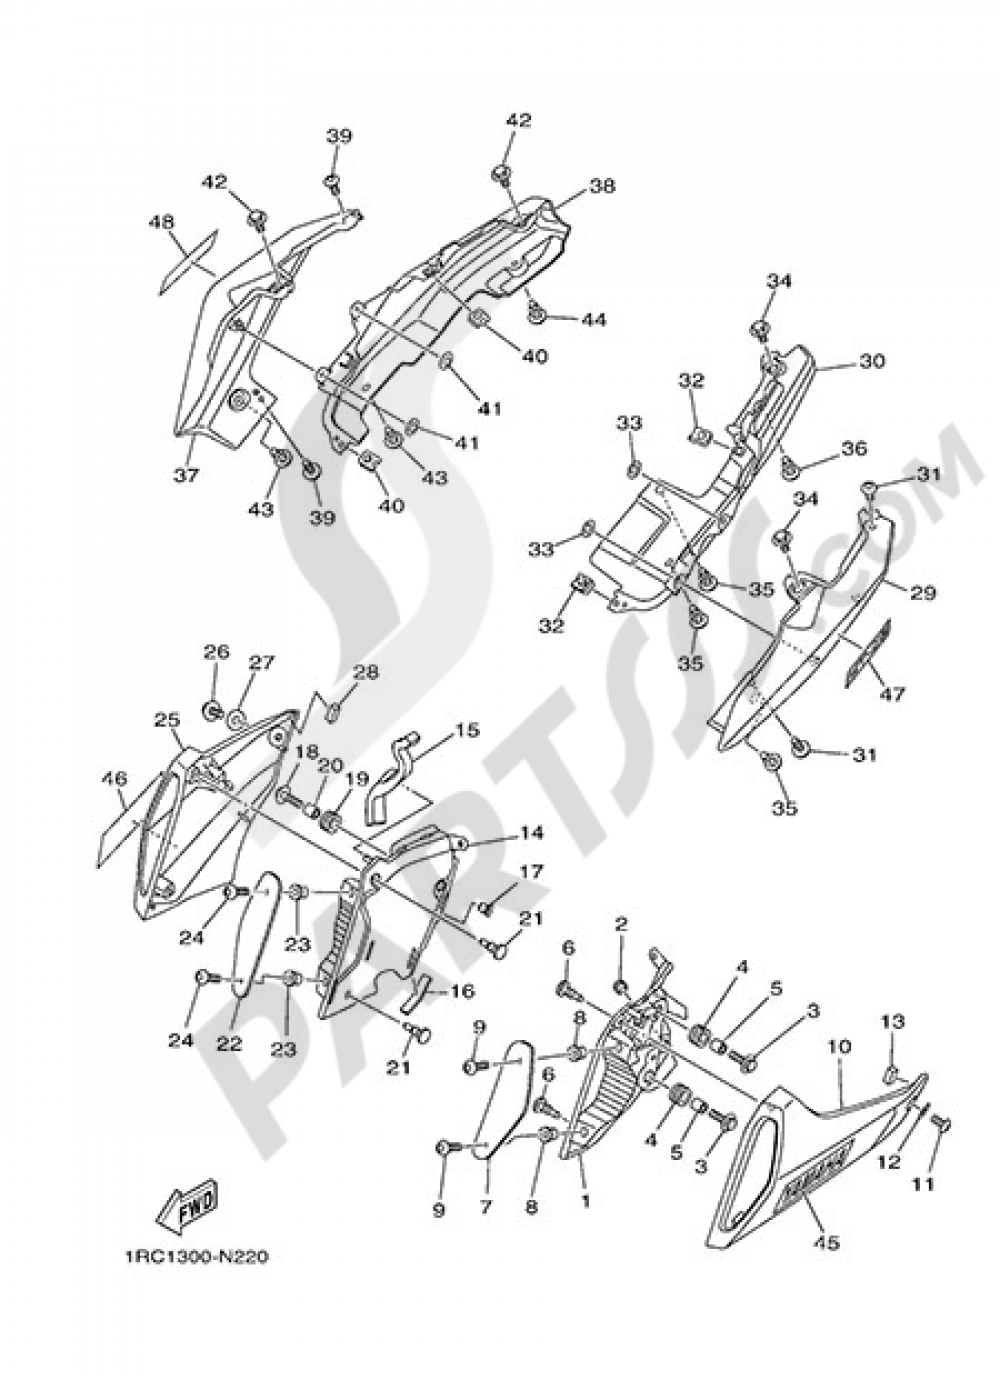 SIDE FAIRING / COWLING Yamaha MT-09 2014